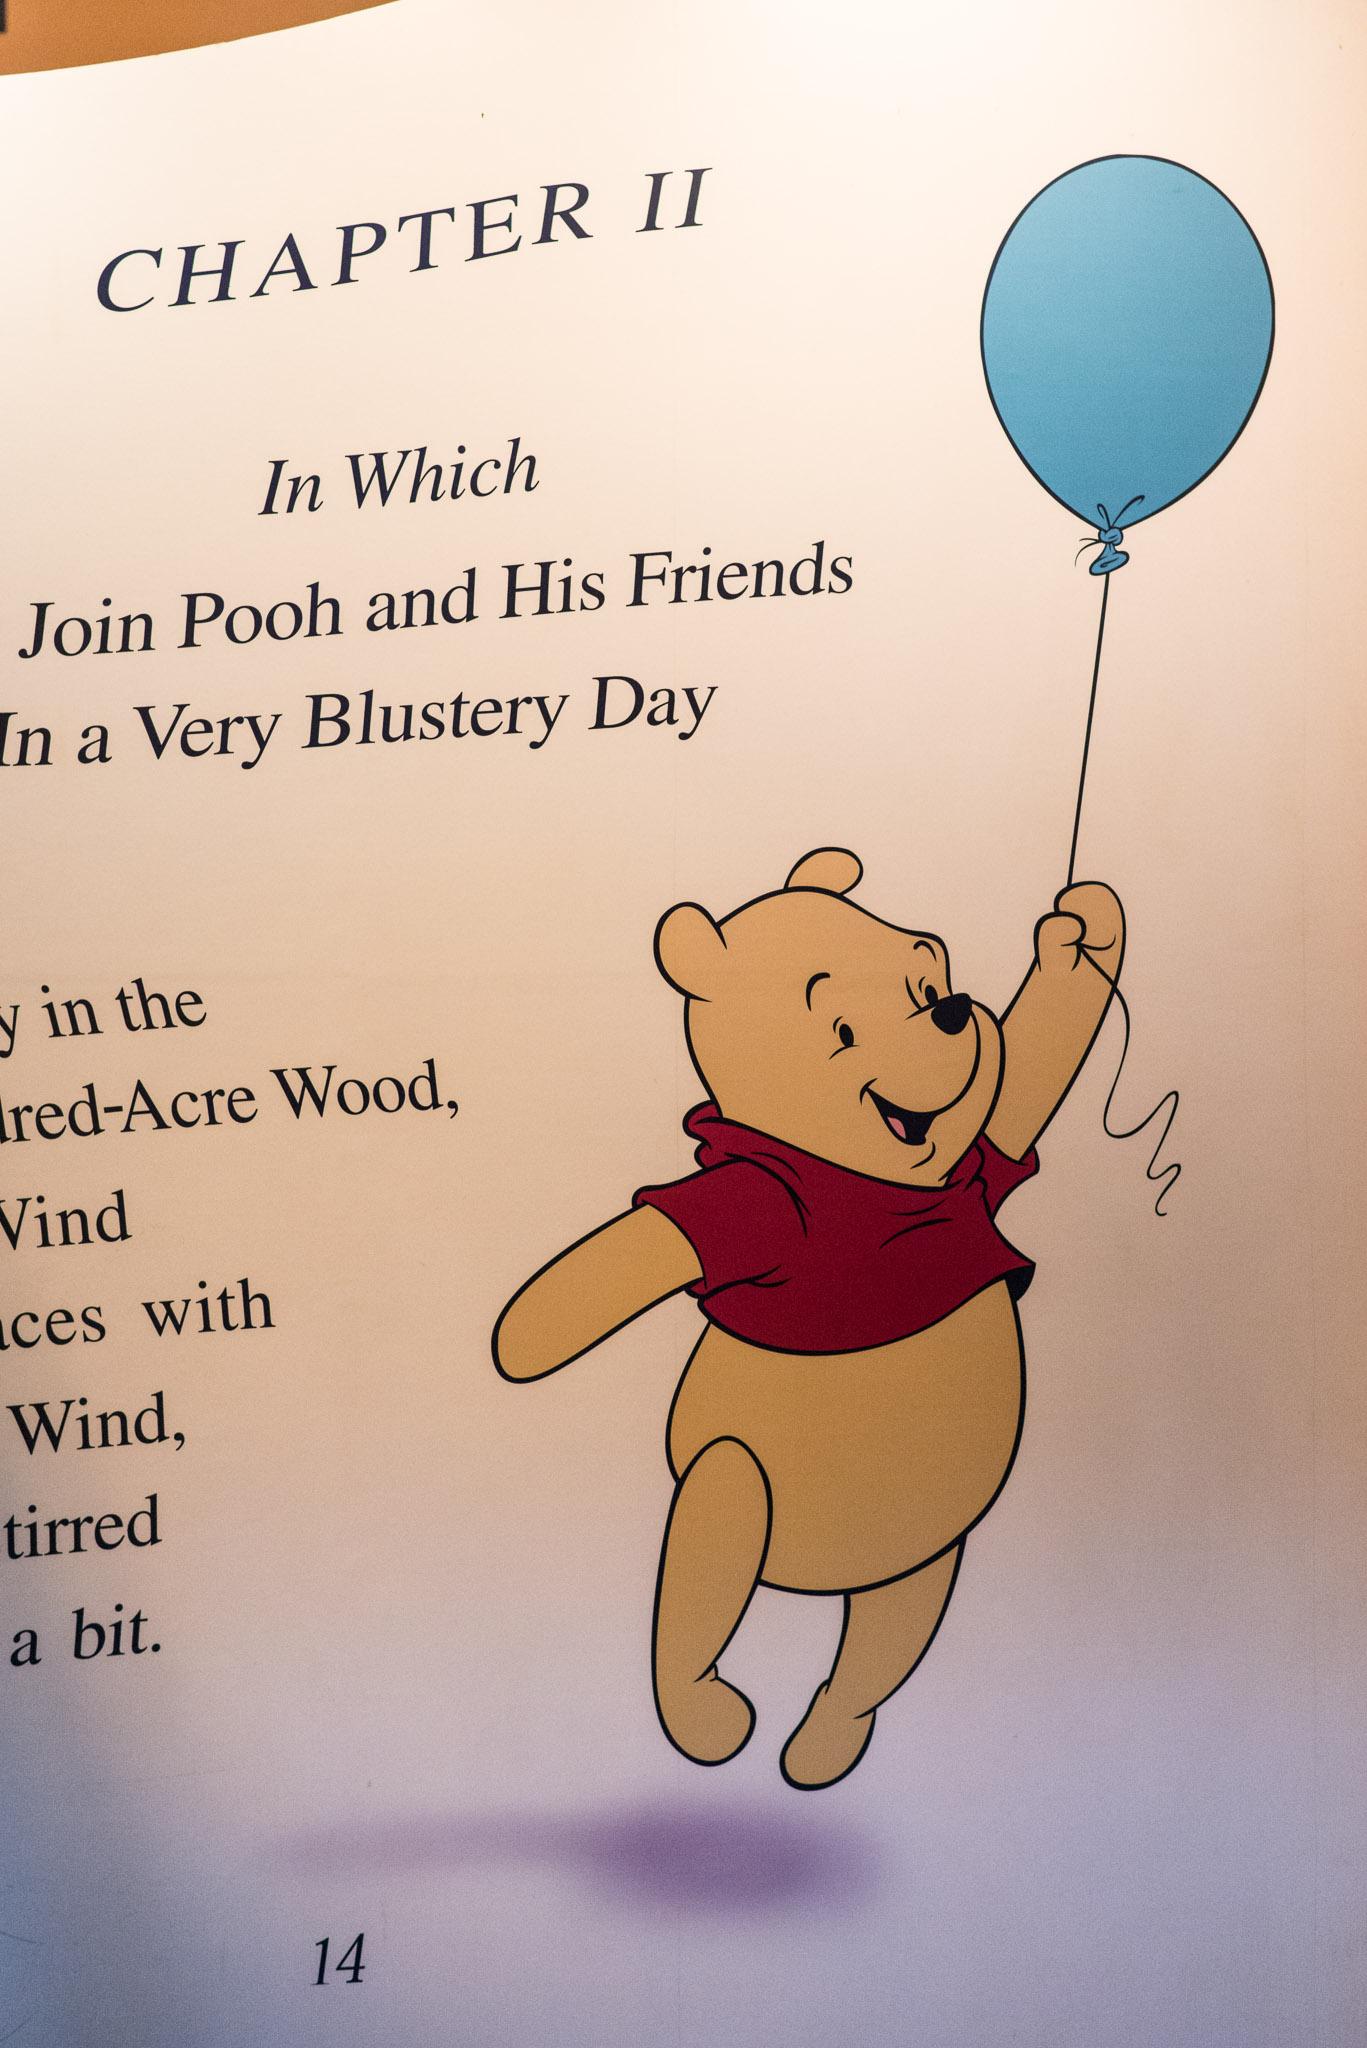 Winnie the Pooh Ride - Walt Disney World Magic Kingdom